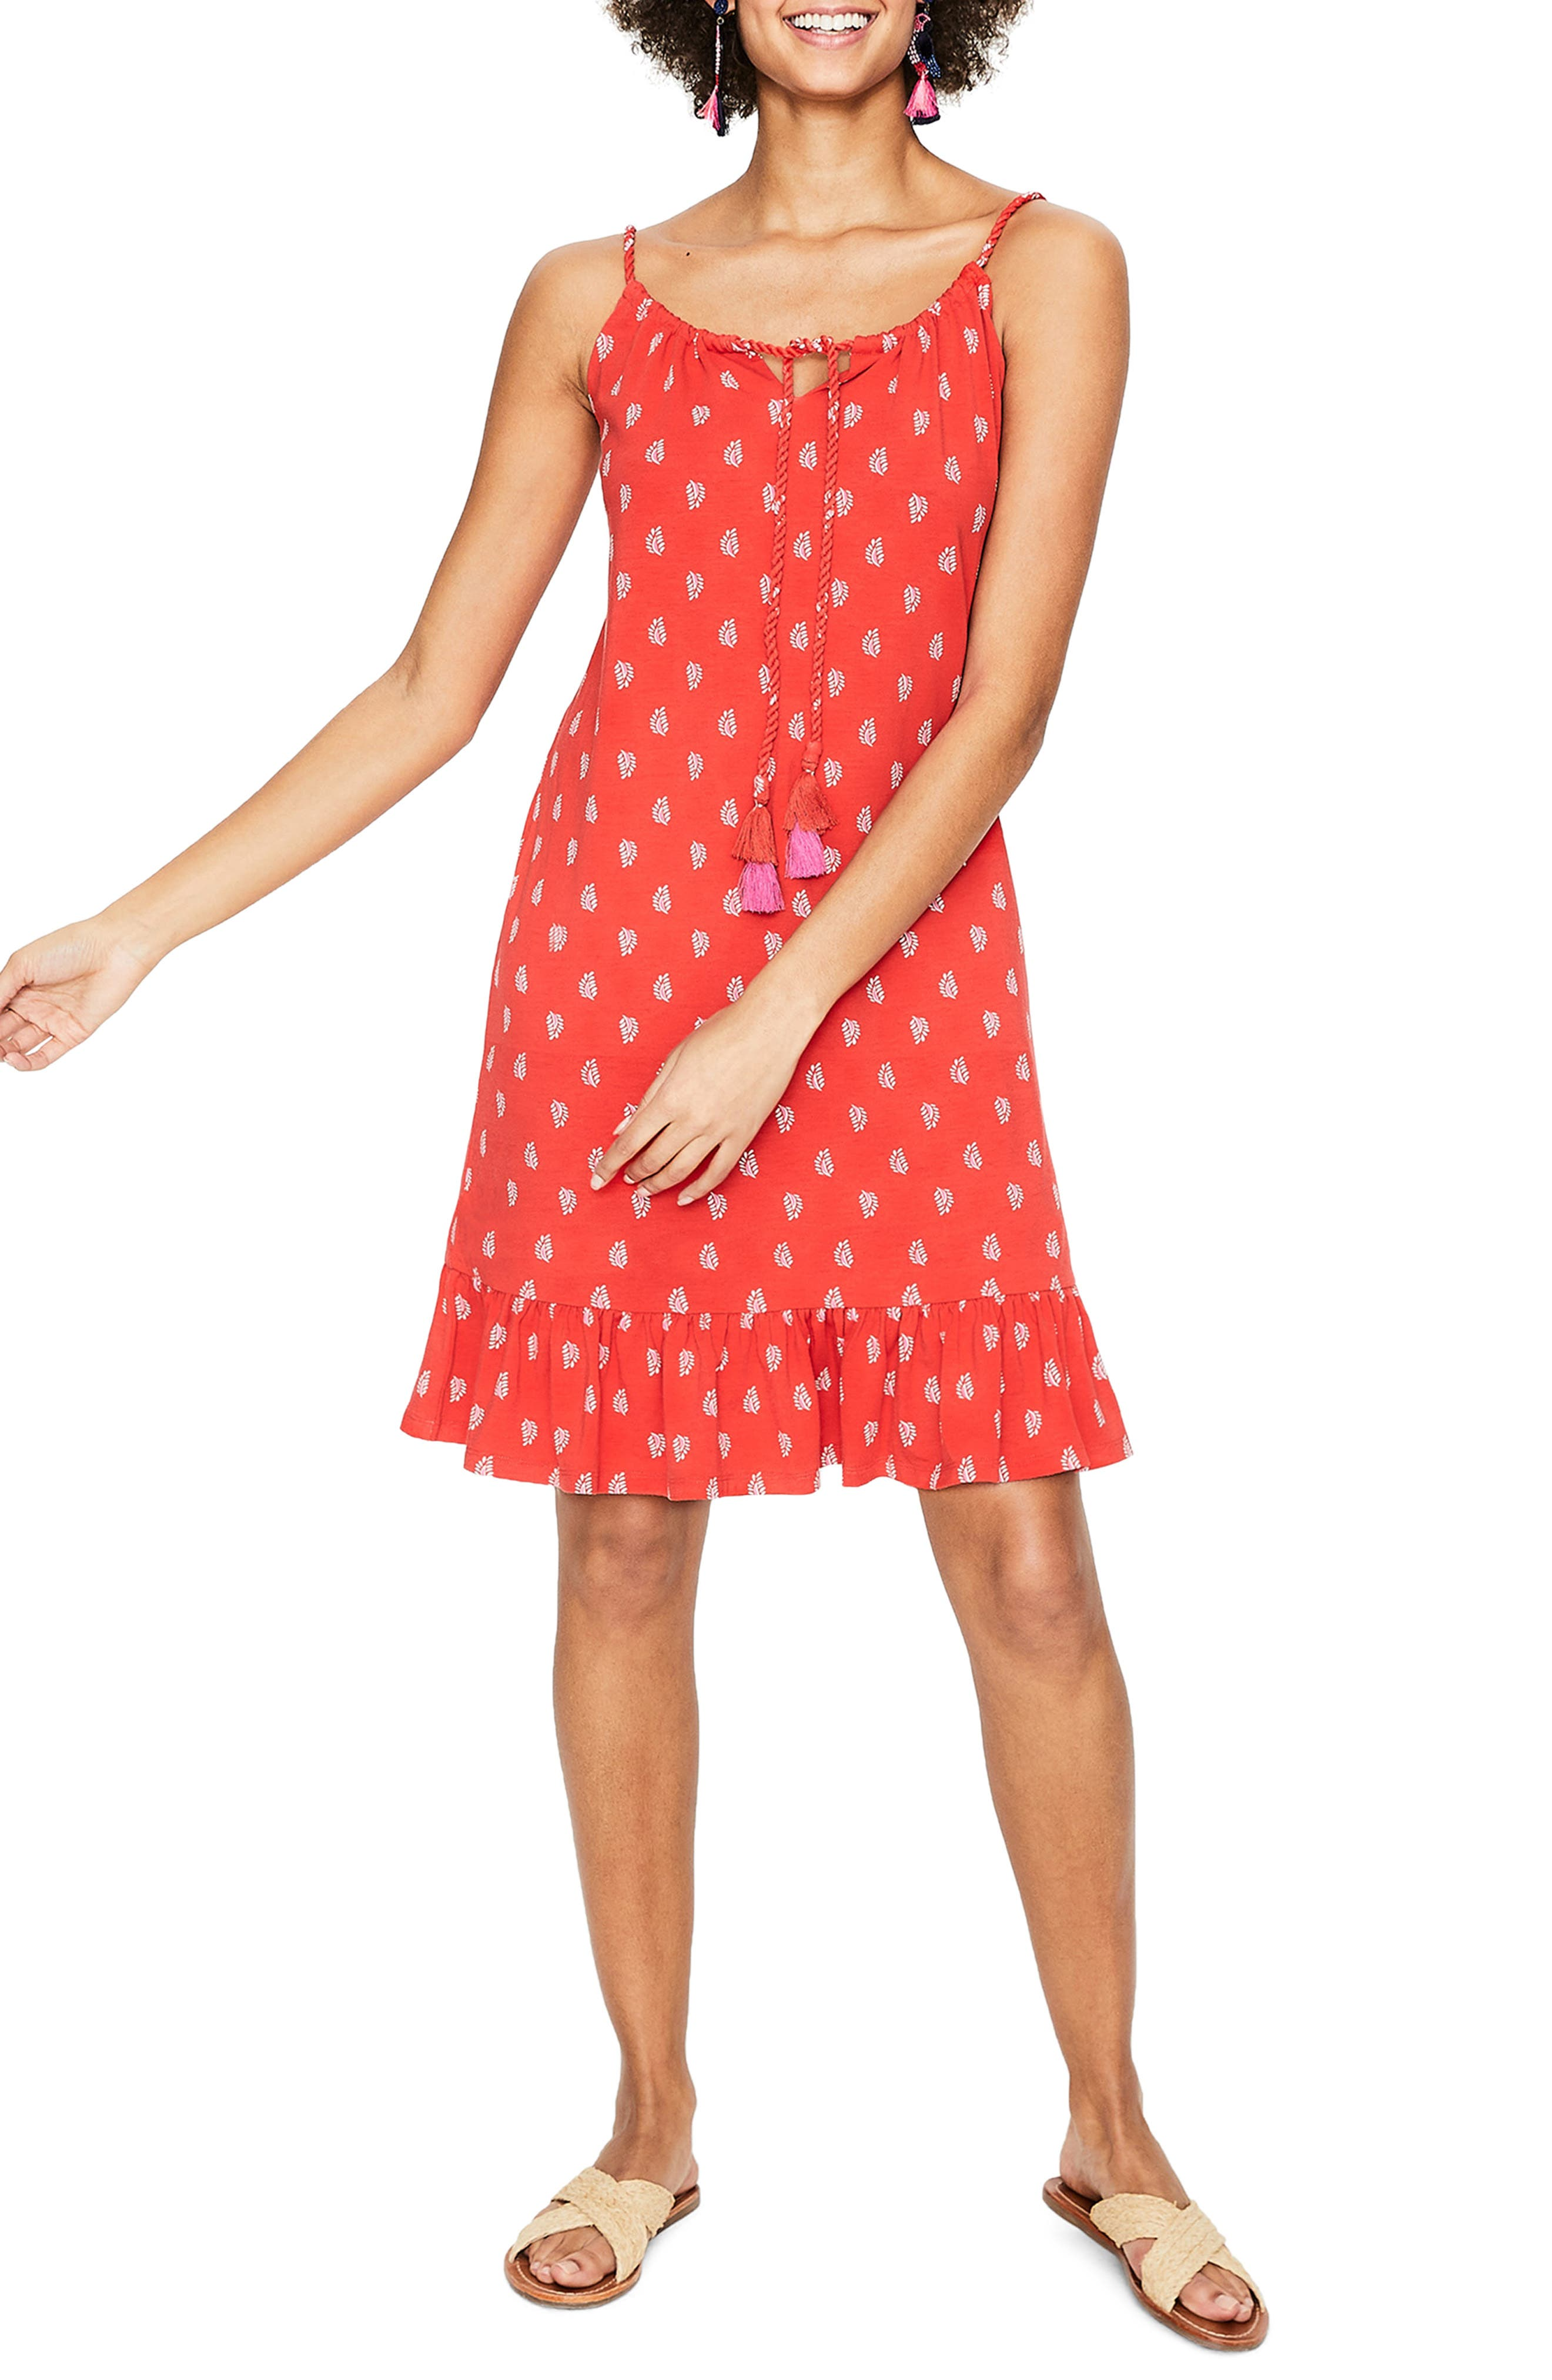 Boden Sophia Print Cotton Blend Jersey Minidress, Red